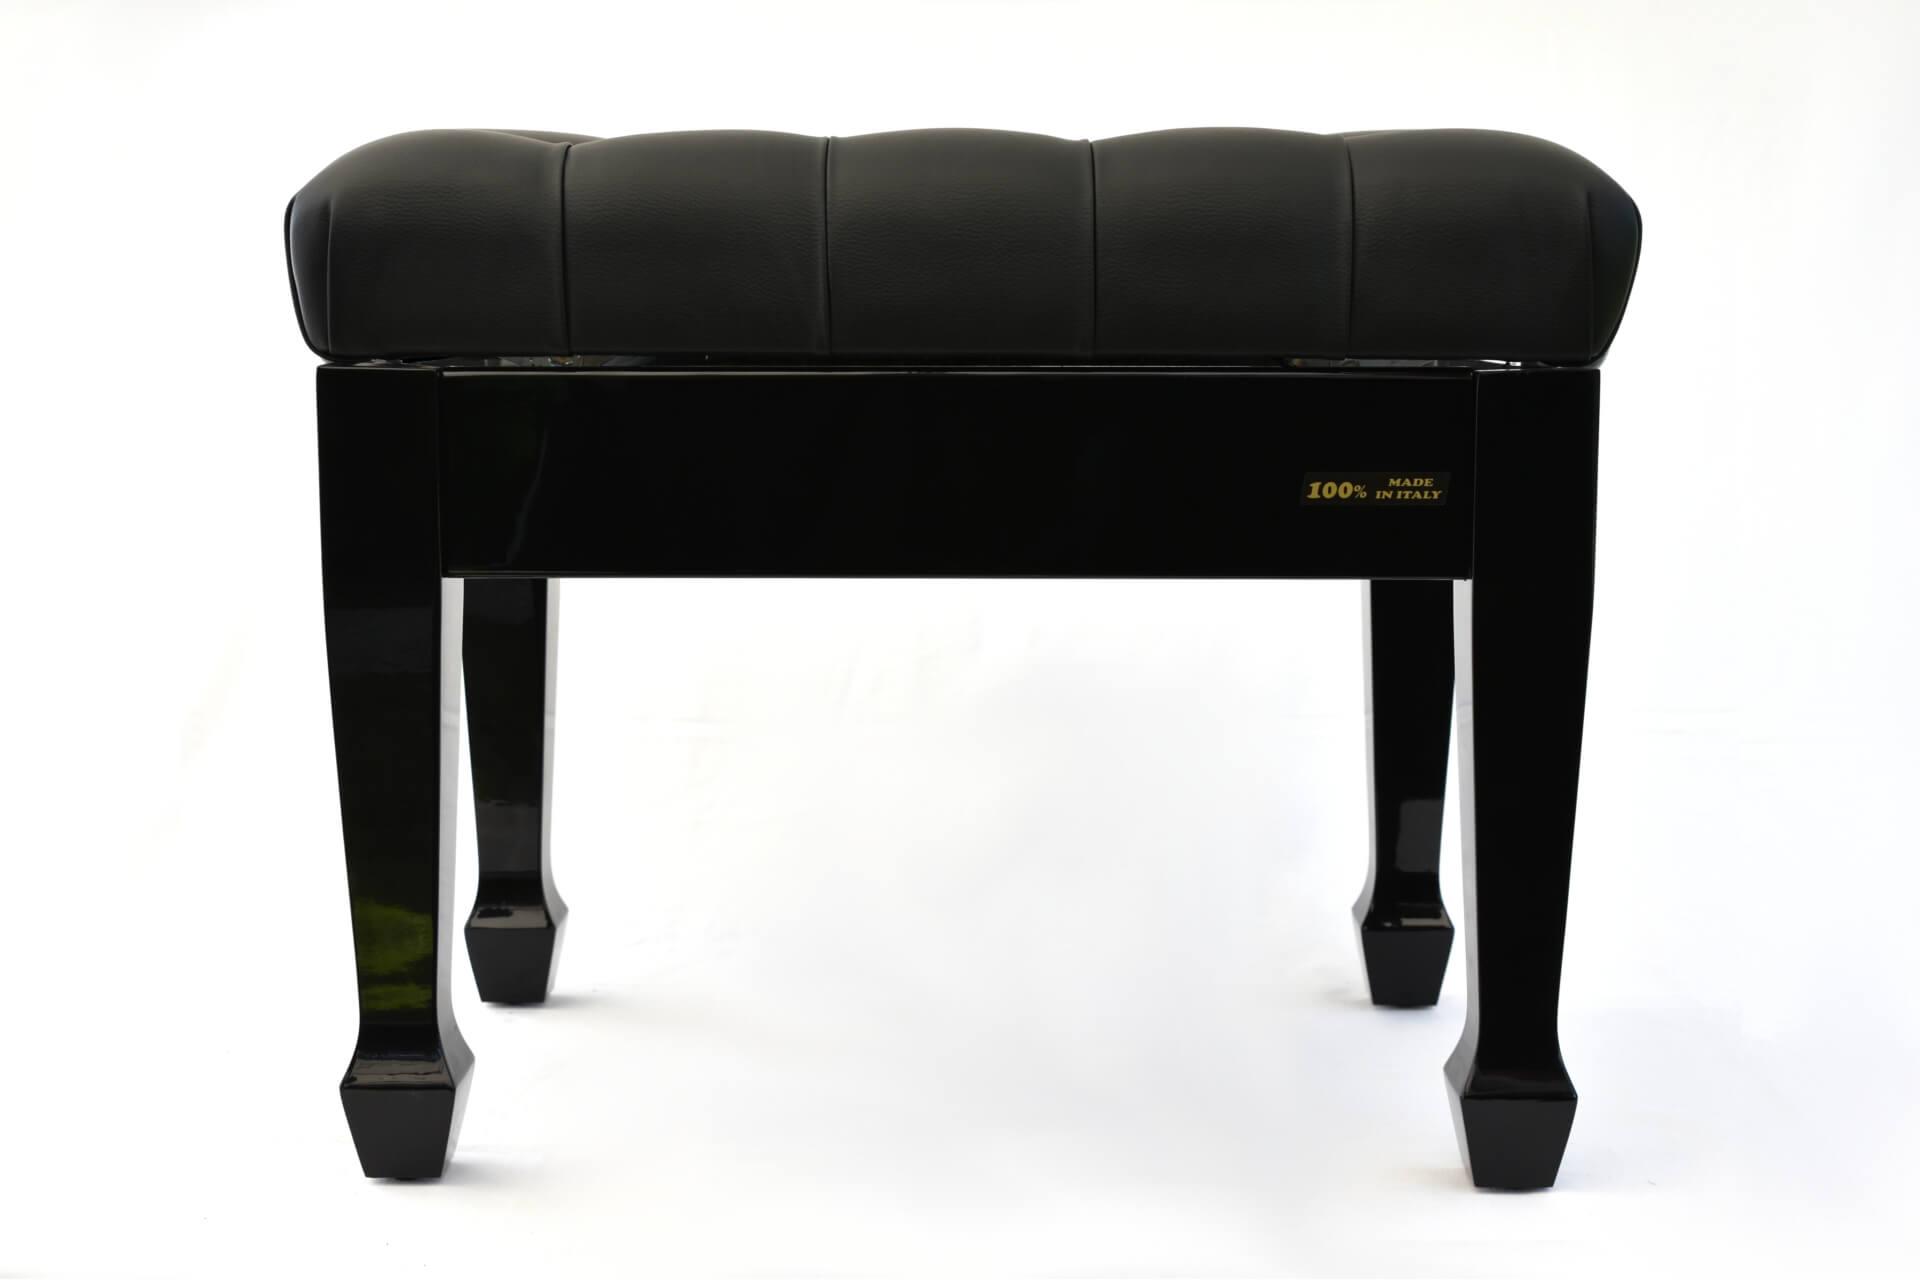 tabouret de piano salieri veritable cuir noir. Black Bedroom Furniture Sets. Home Design Ideas